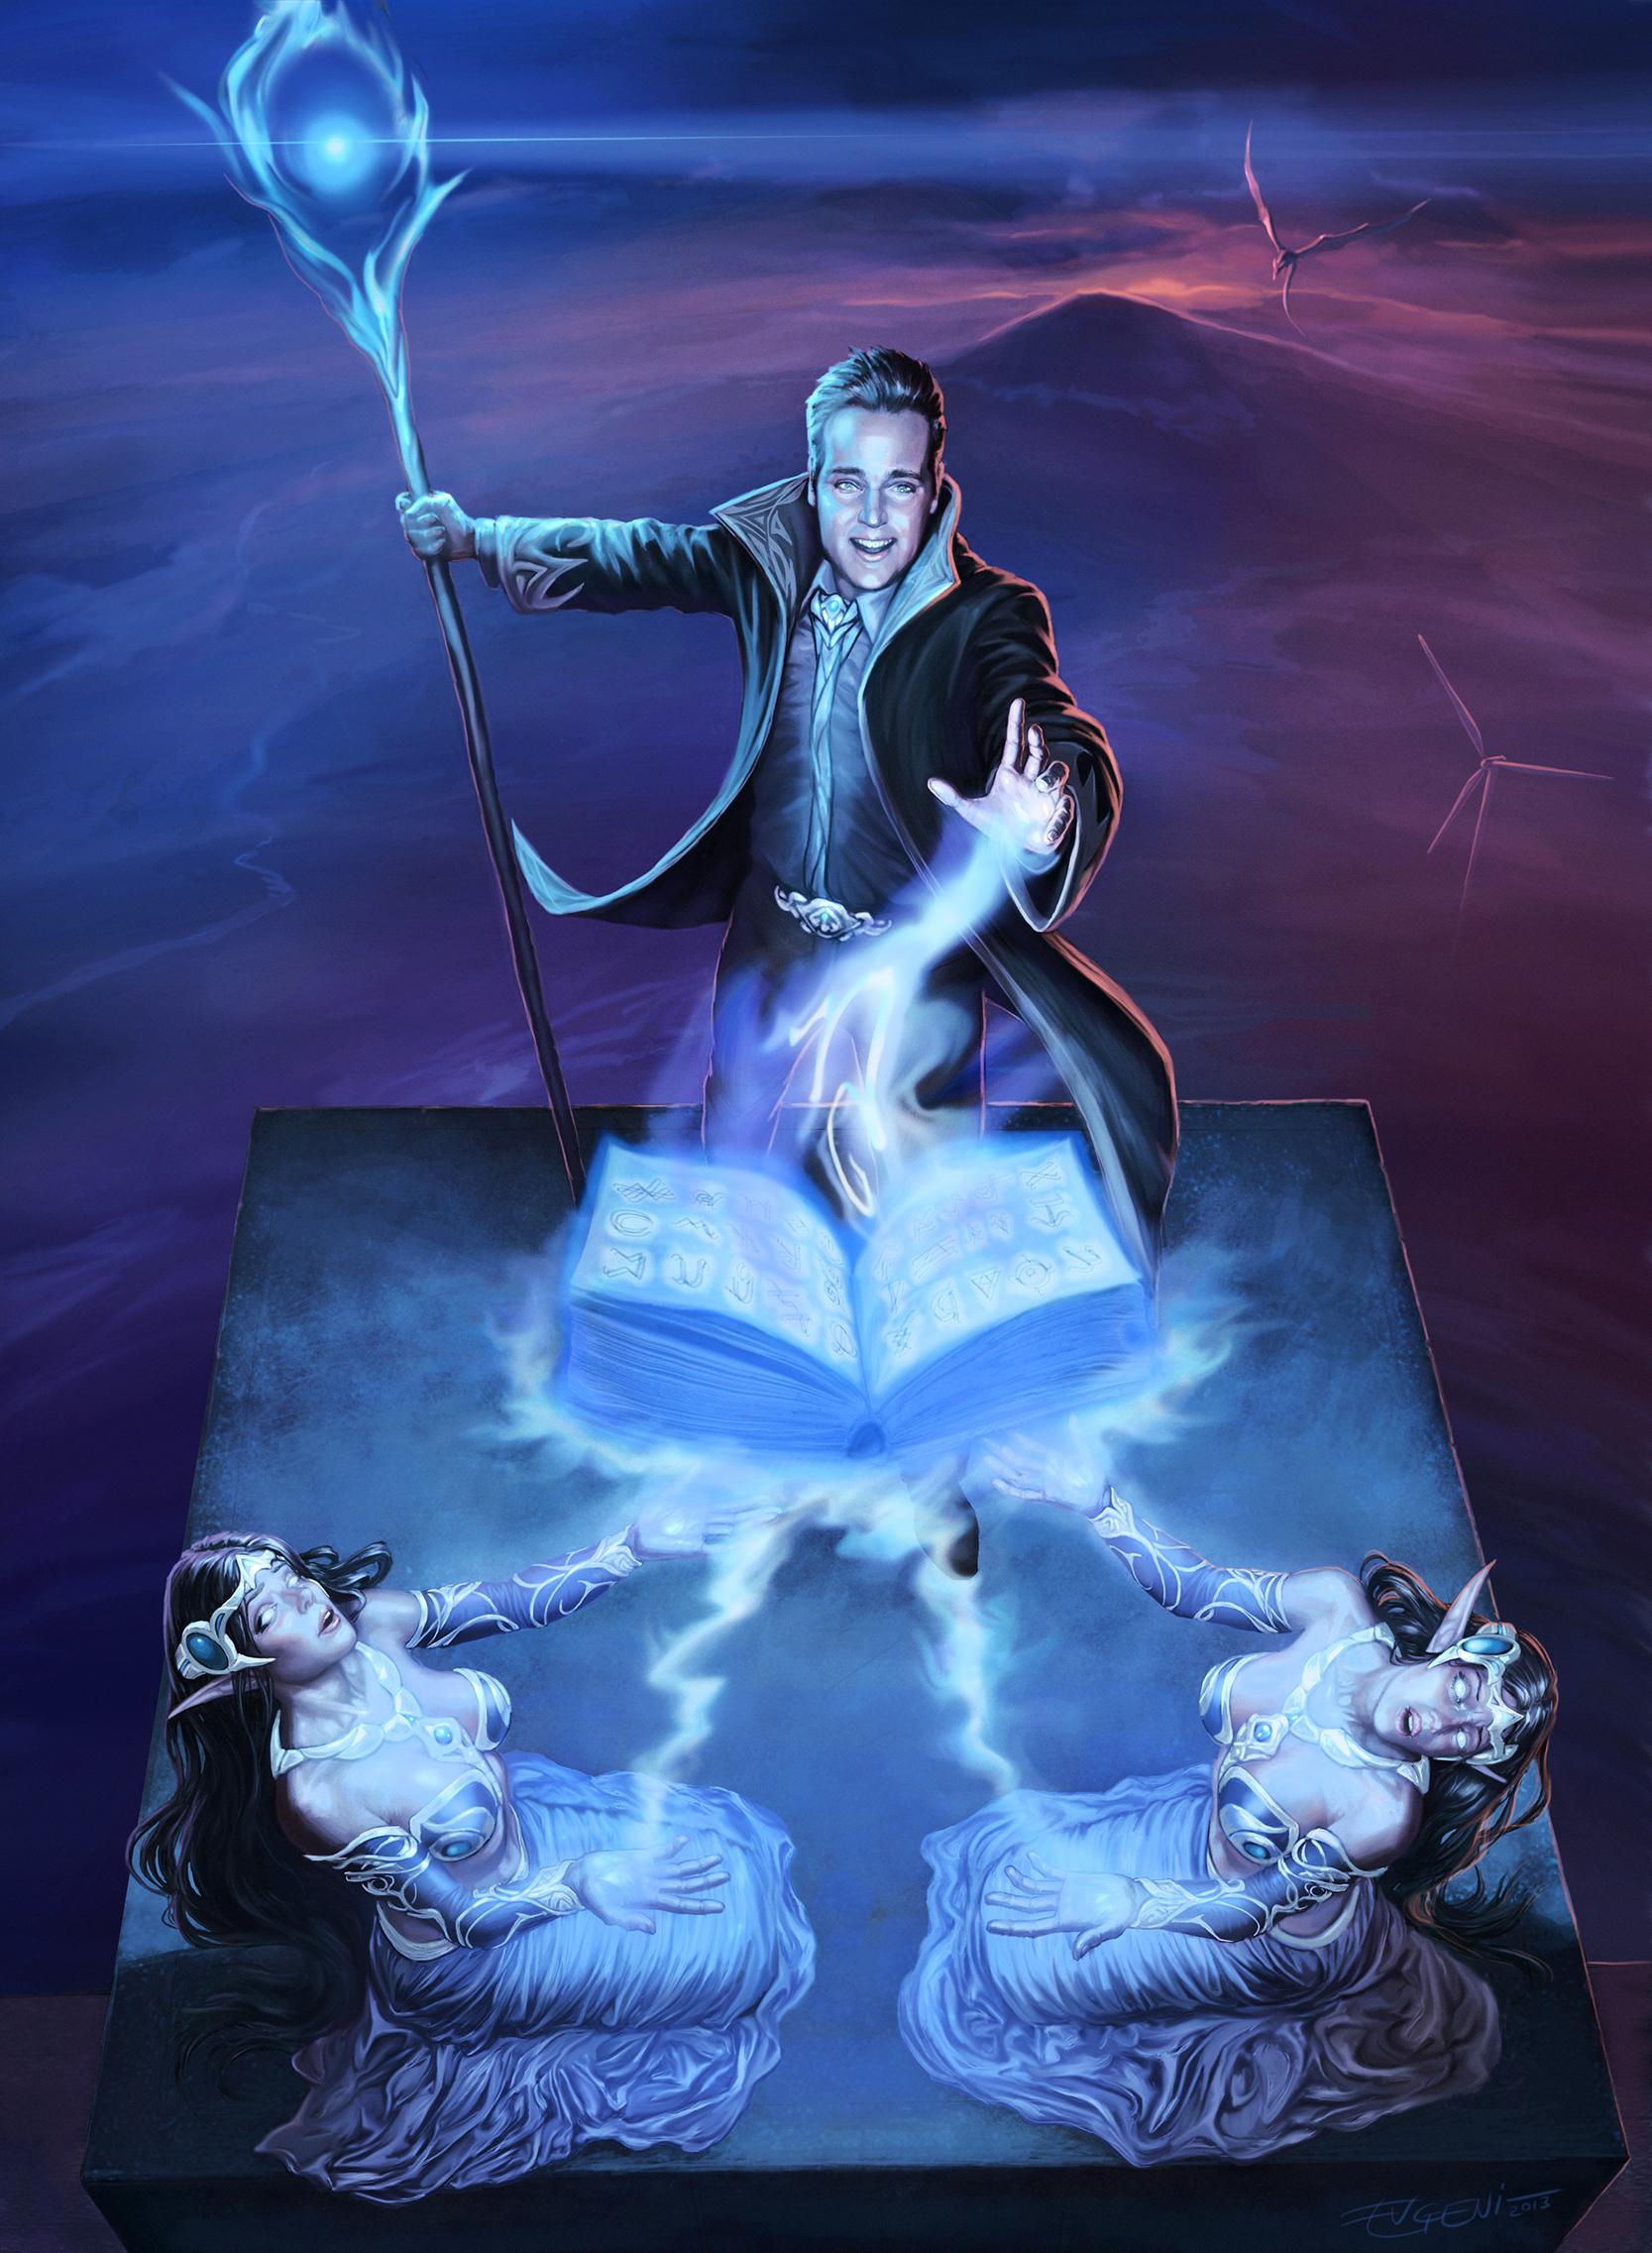 young wizard by evgenihristov on deviantart